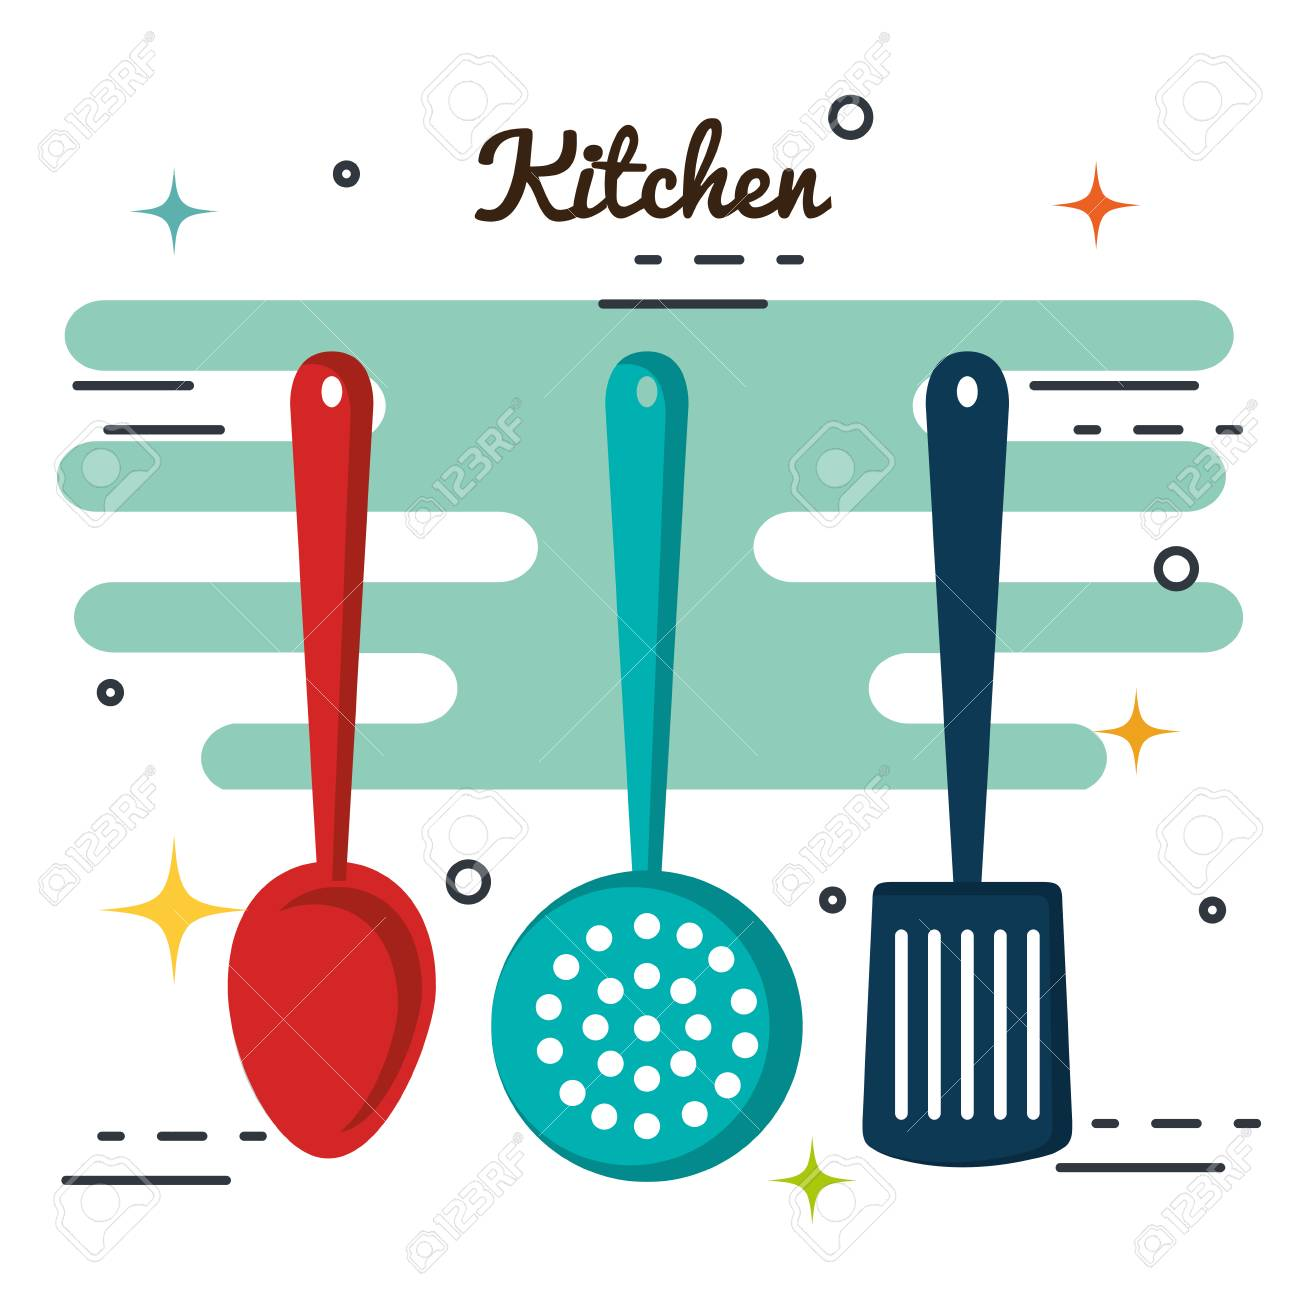 Kitchen Utensils Over White Background Vector Illustration Royalty ...